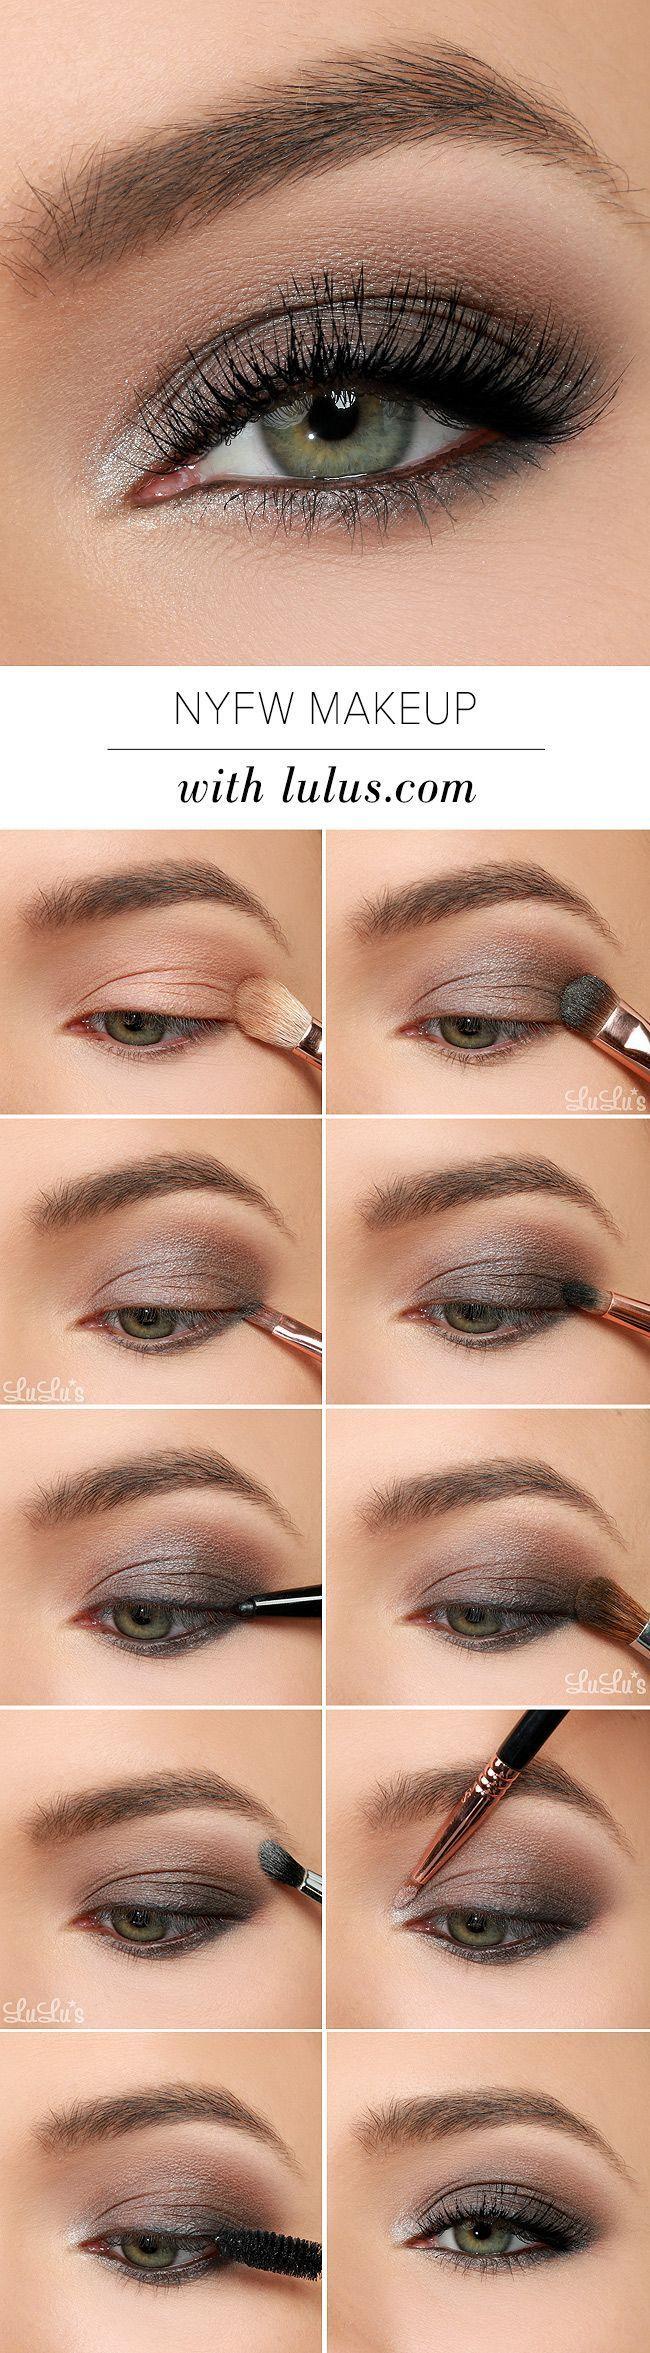 How to NYFW inspired Eye Make-up tutorial. Grayish & Brown Eye shadow for dull days